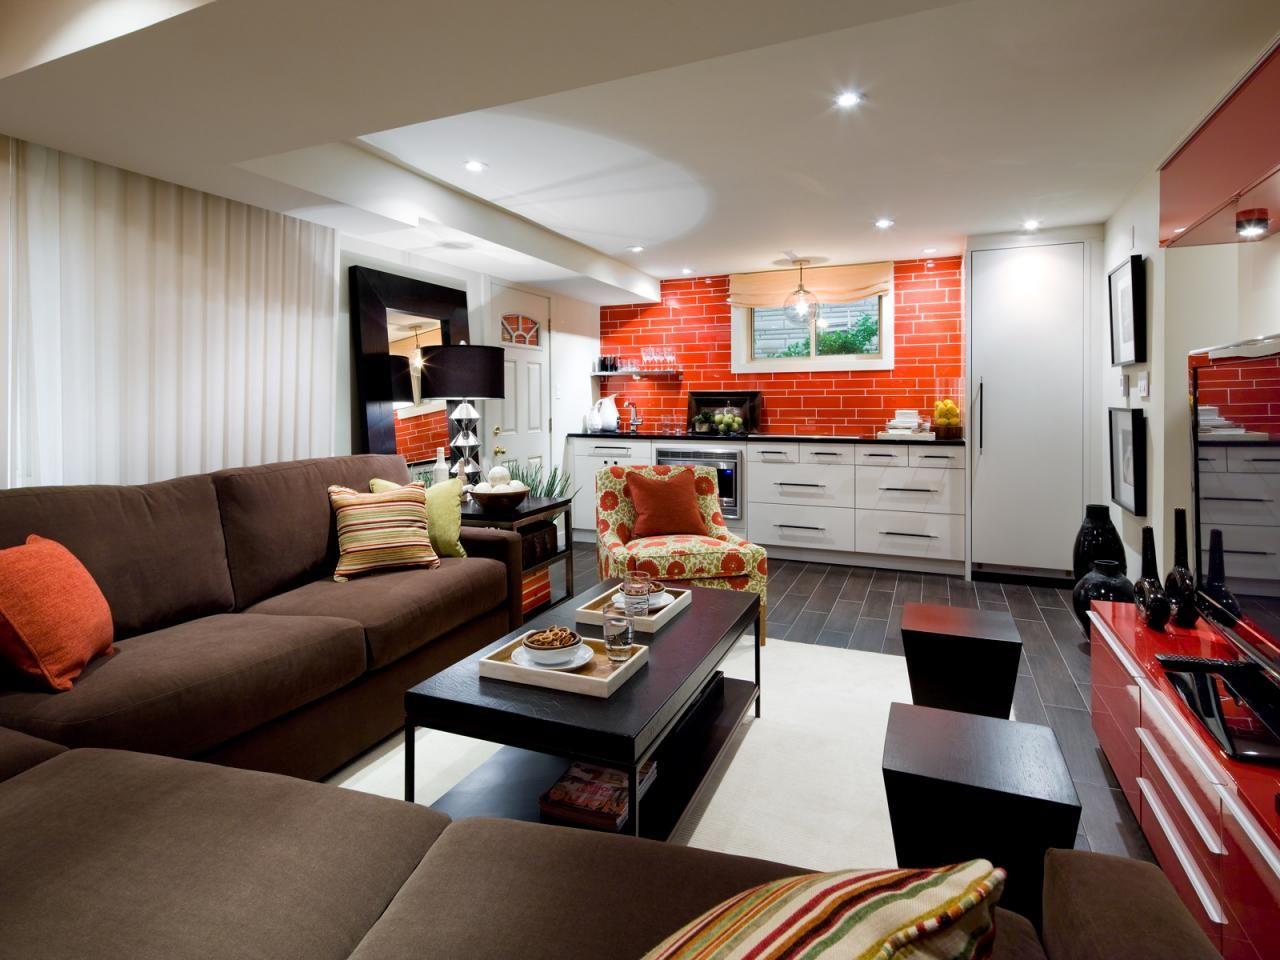 10 chic basements by candice olson - Basement Design